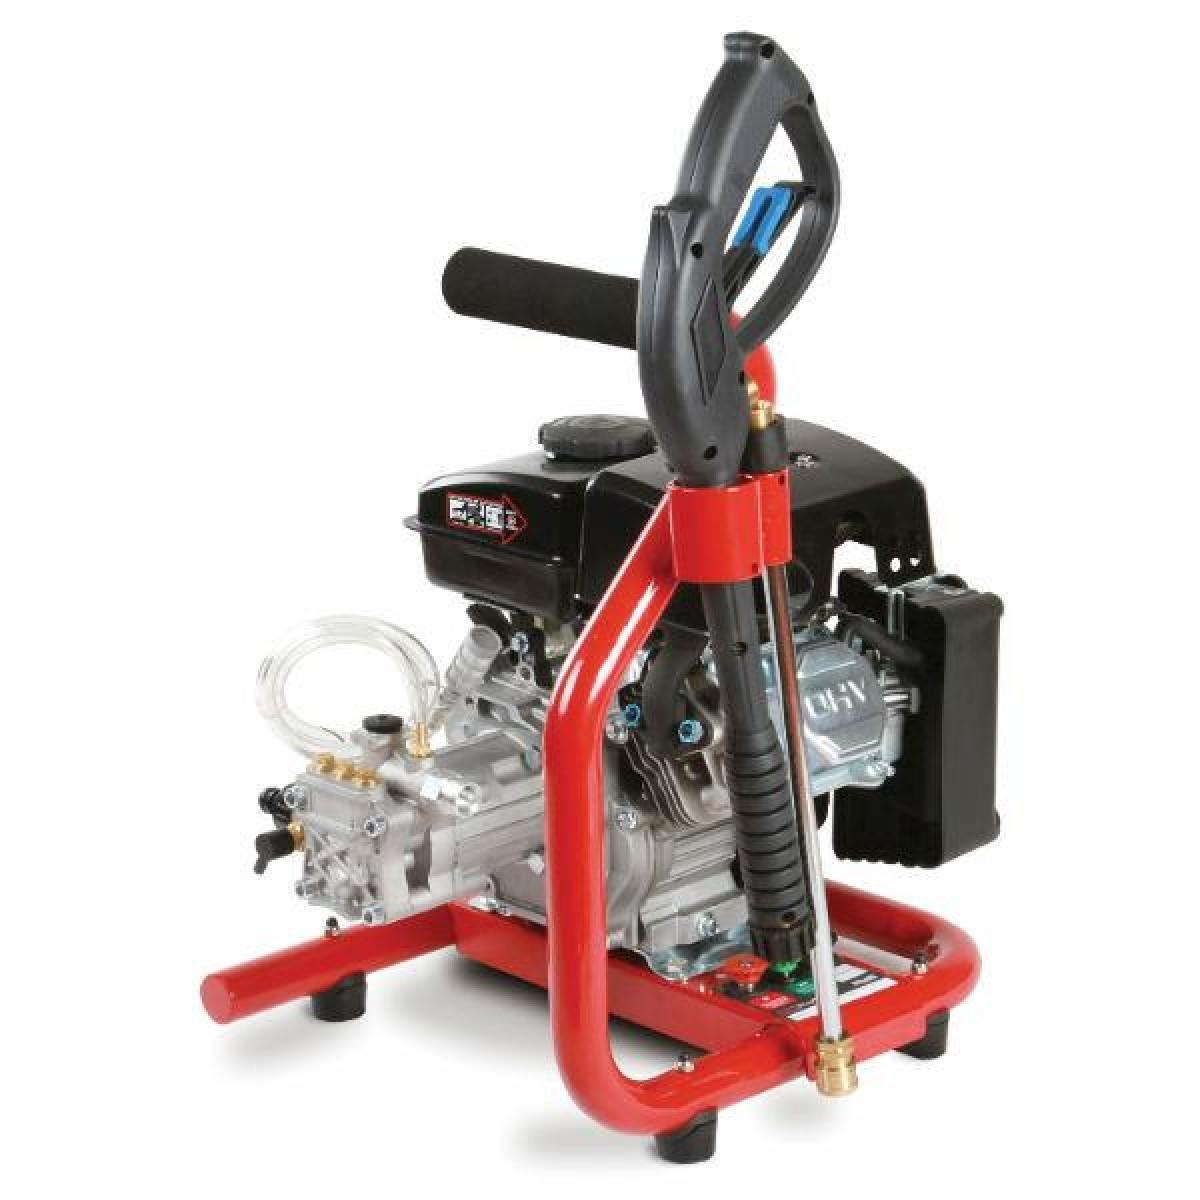 proplus 3hp portable petrol pressure washer pump 95 bar. Black Bedroom Furniture Sets. Home Design Ideas